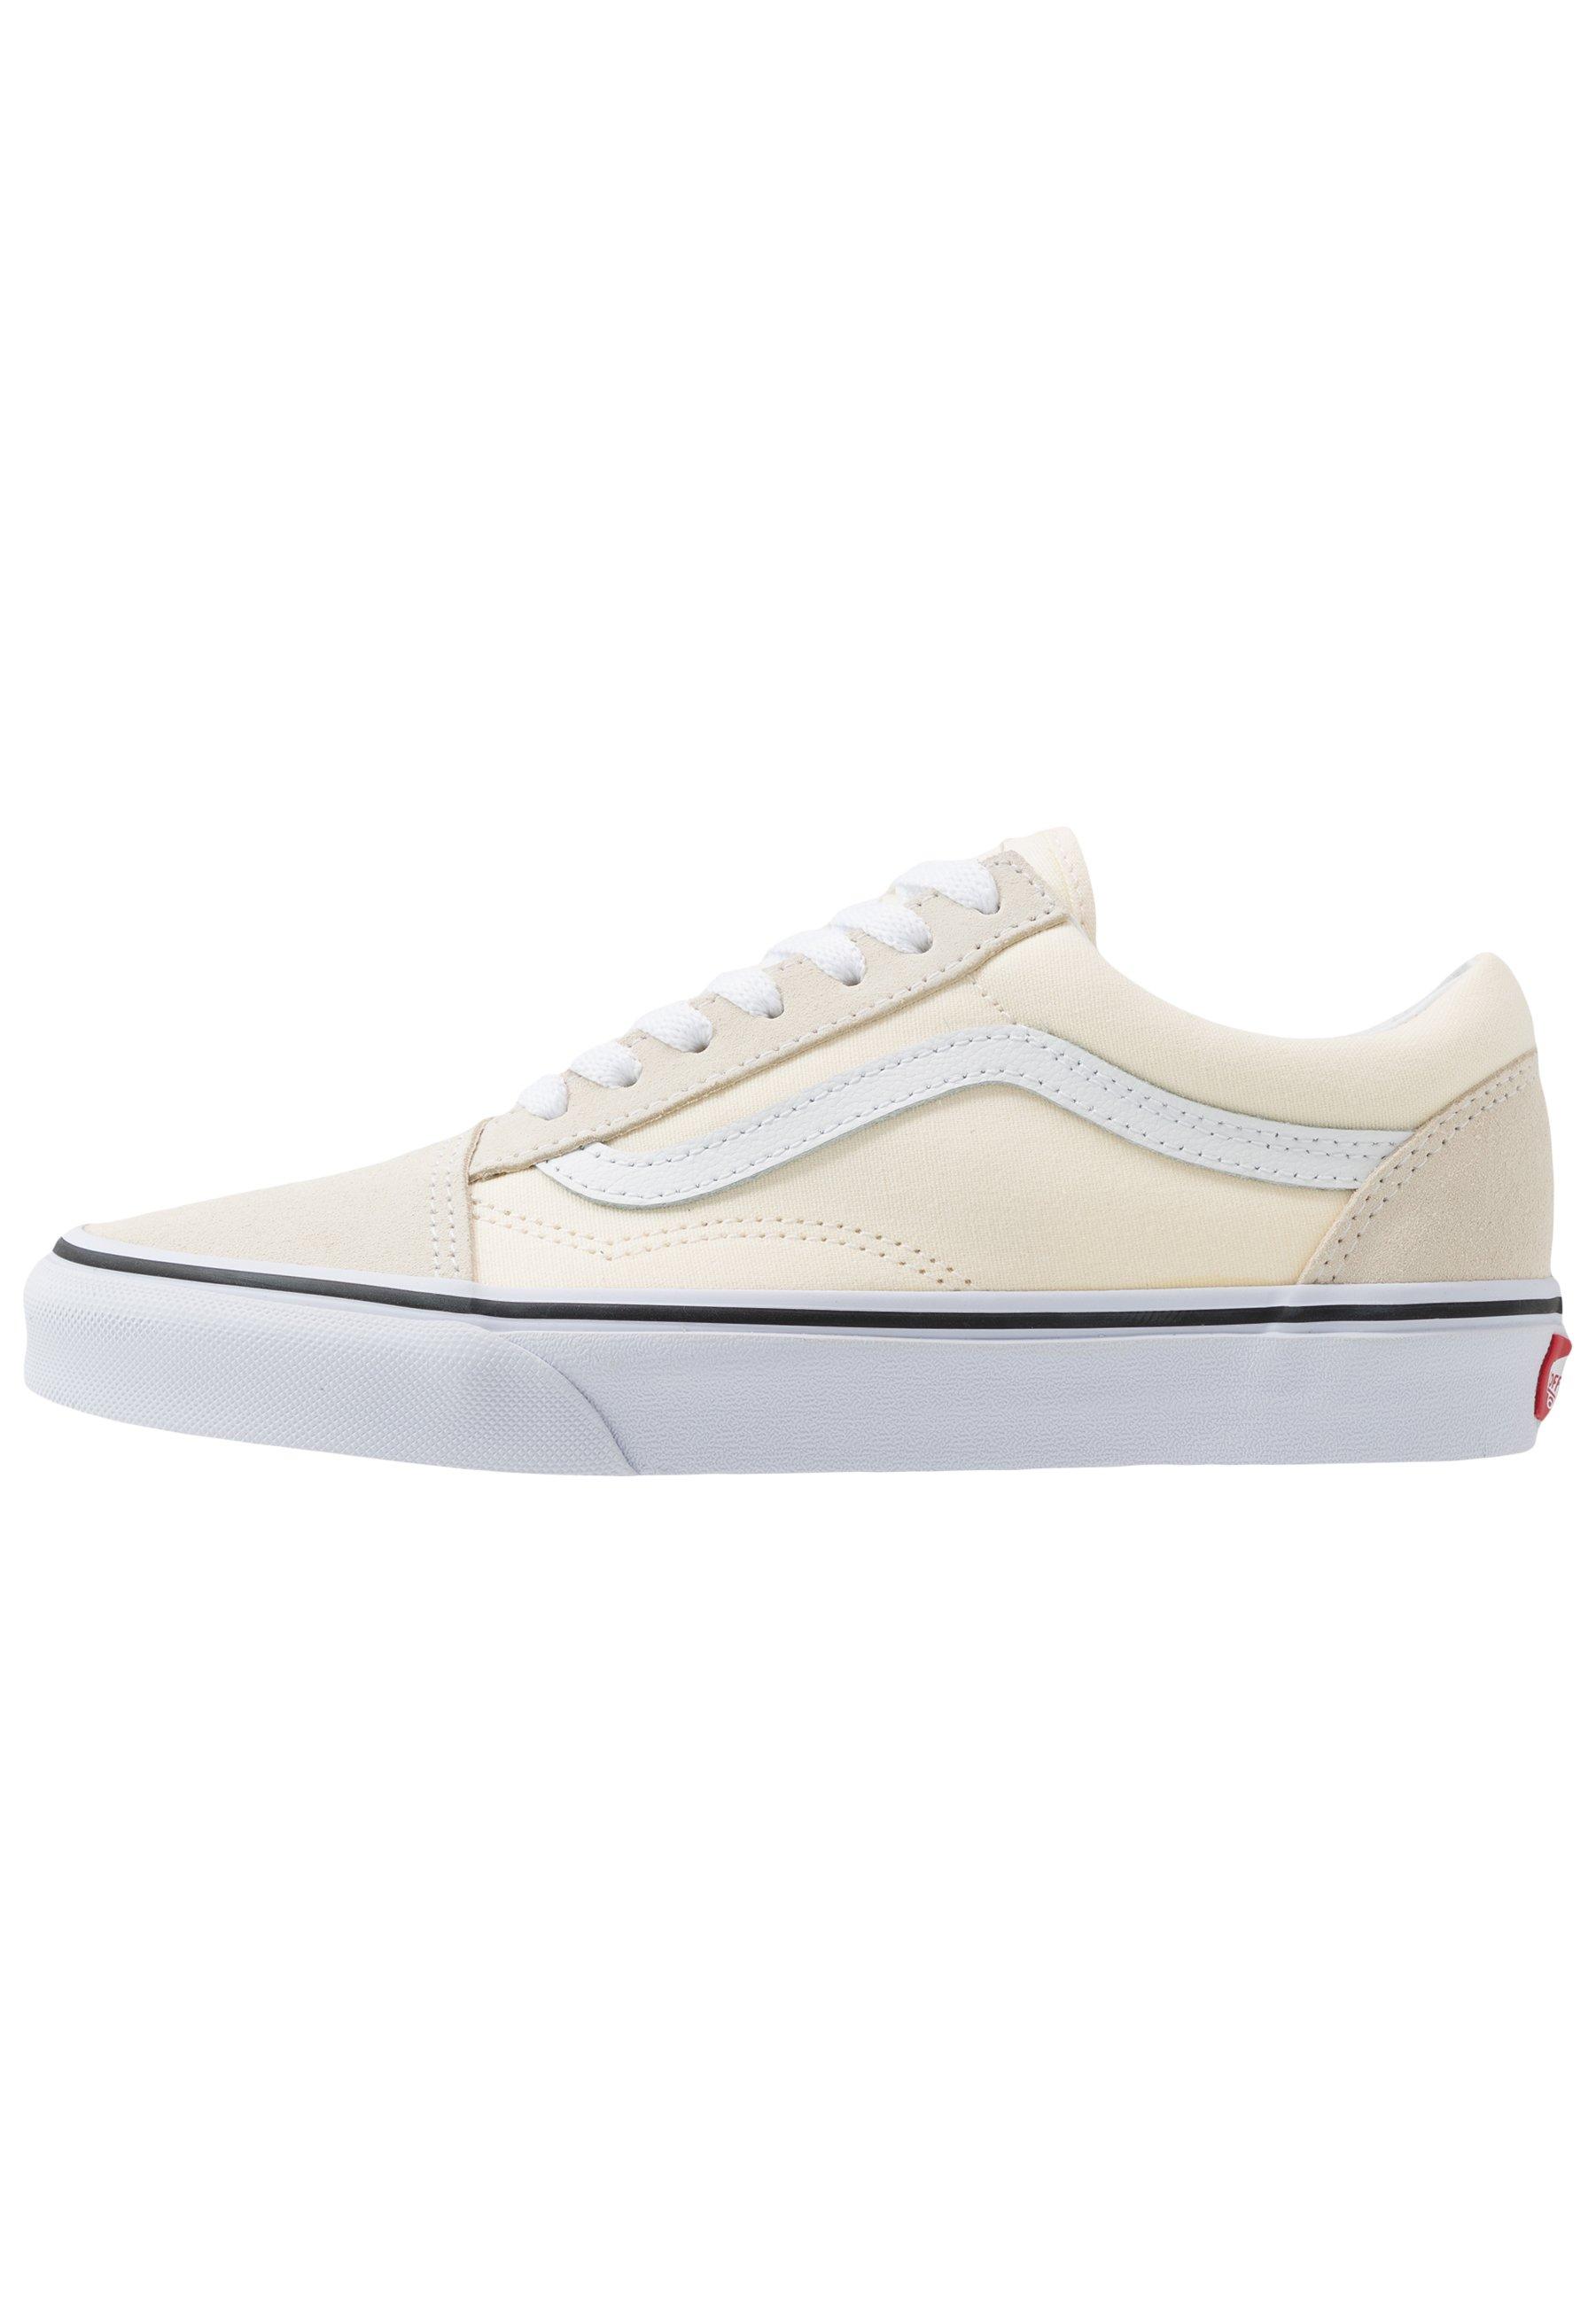 Vans OLD SKOOL UNISEX - Trainers - classic white/true white/off ...